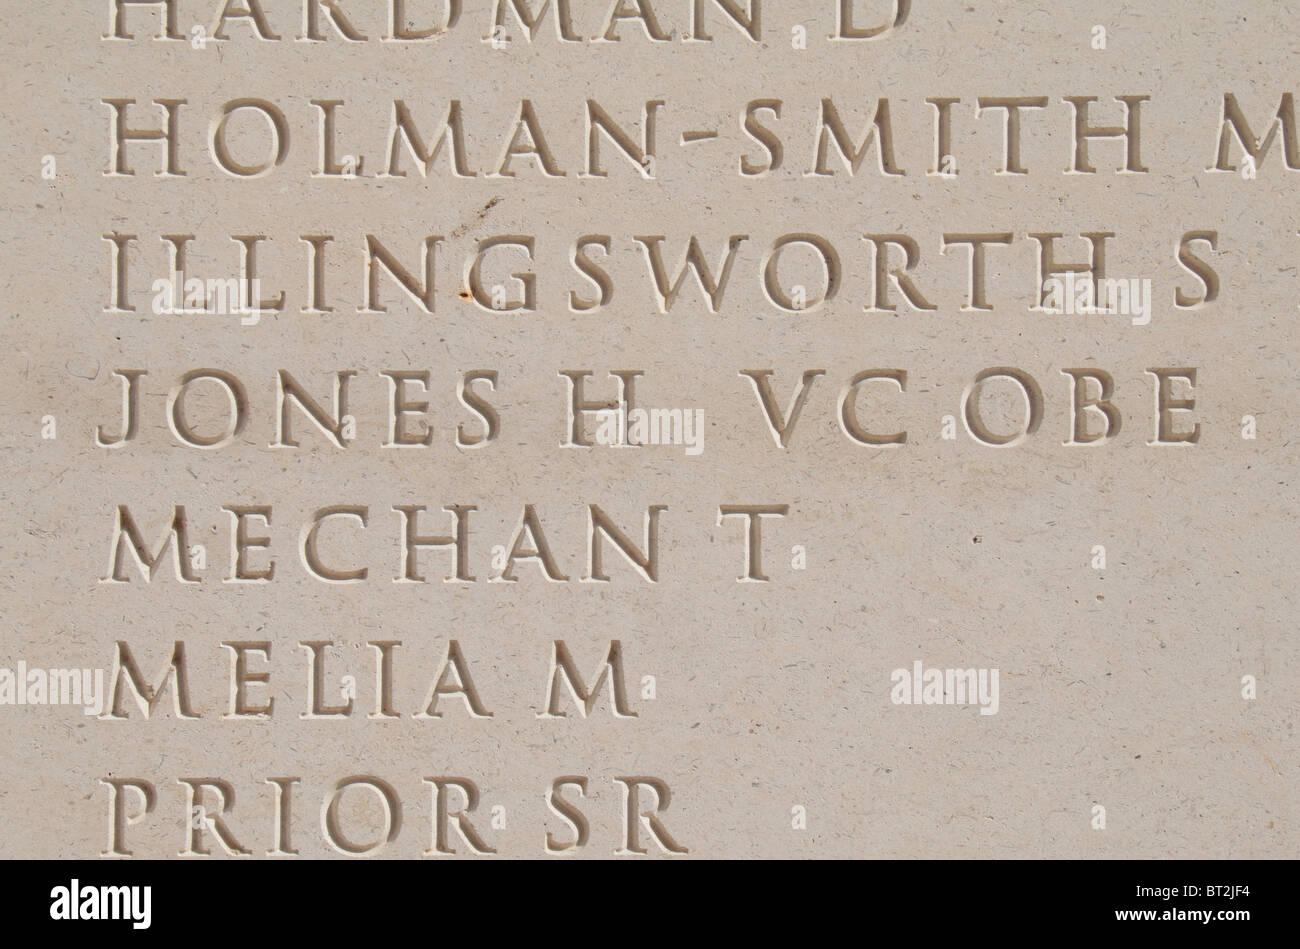 Lieutenant-Colonel Herbert Jones VC OBE on the Armed Forces Memorial, National Memorial Arboretum, Alrewas, Staffordshire, - Stock Image